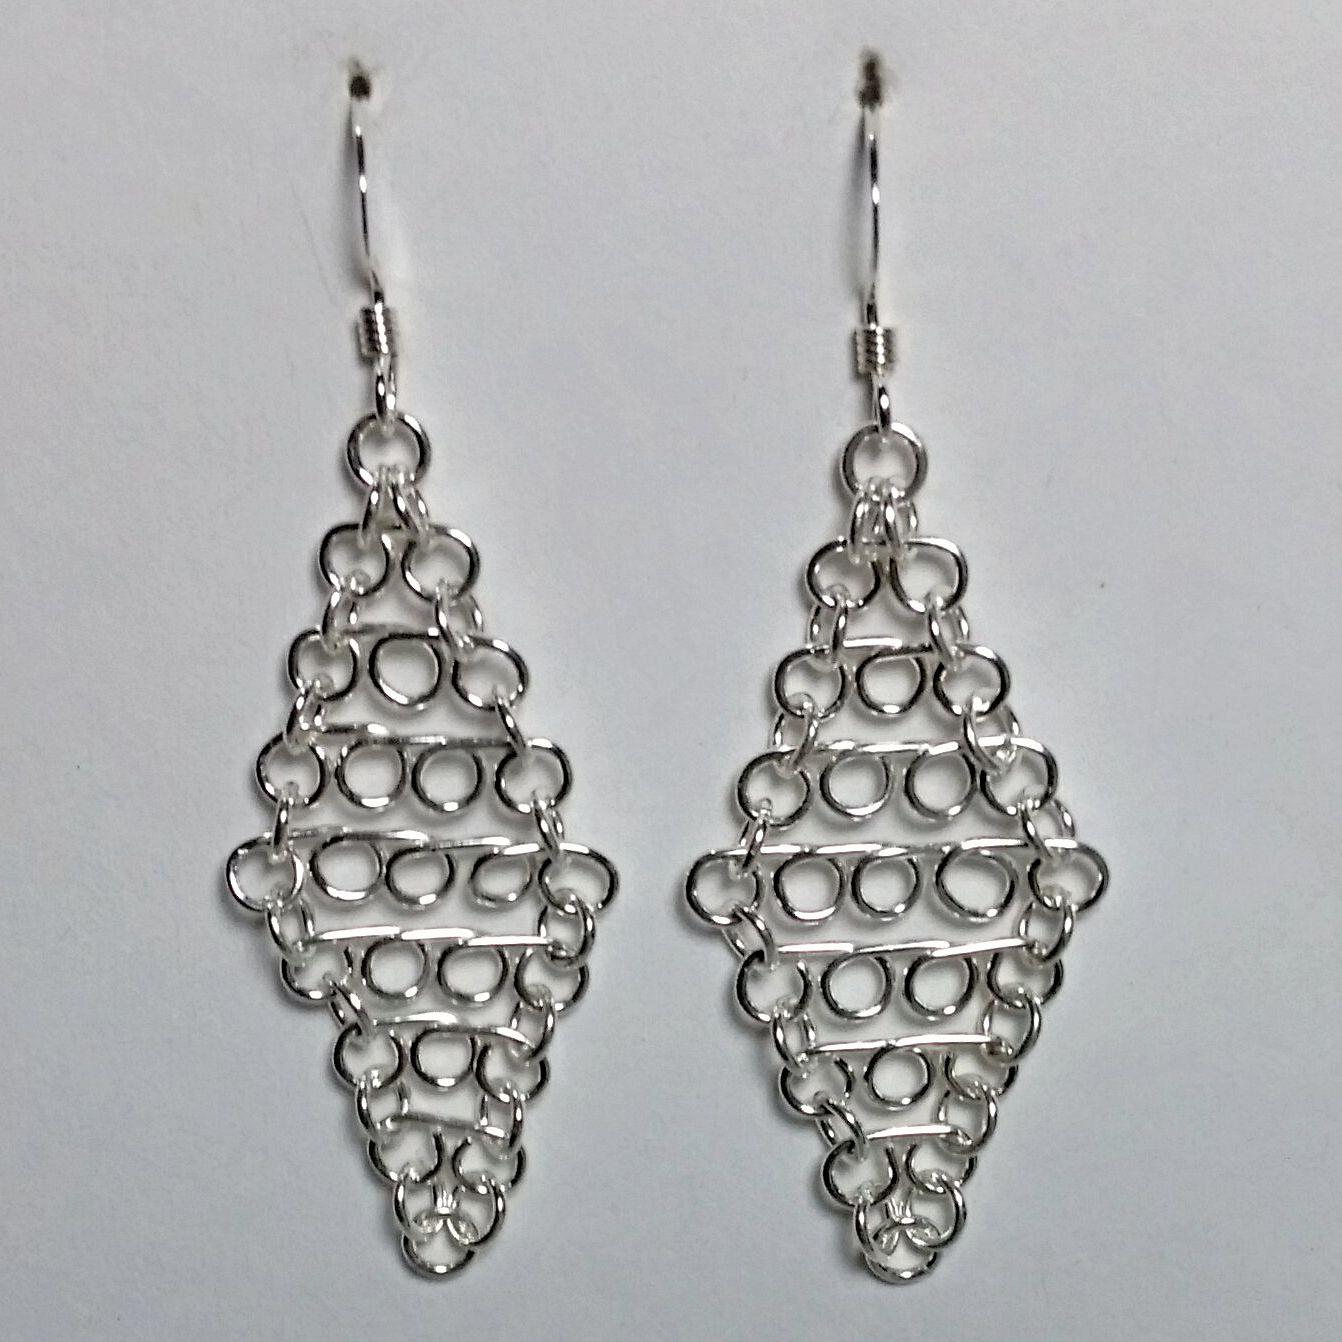 Sterling Silver Handmade Wire Formed Diamond Shaped Earrings 11720